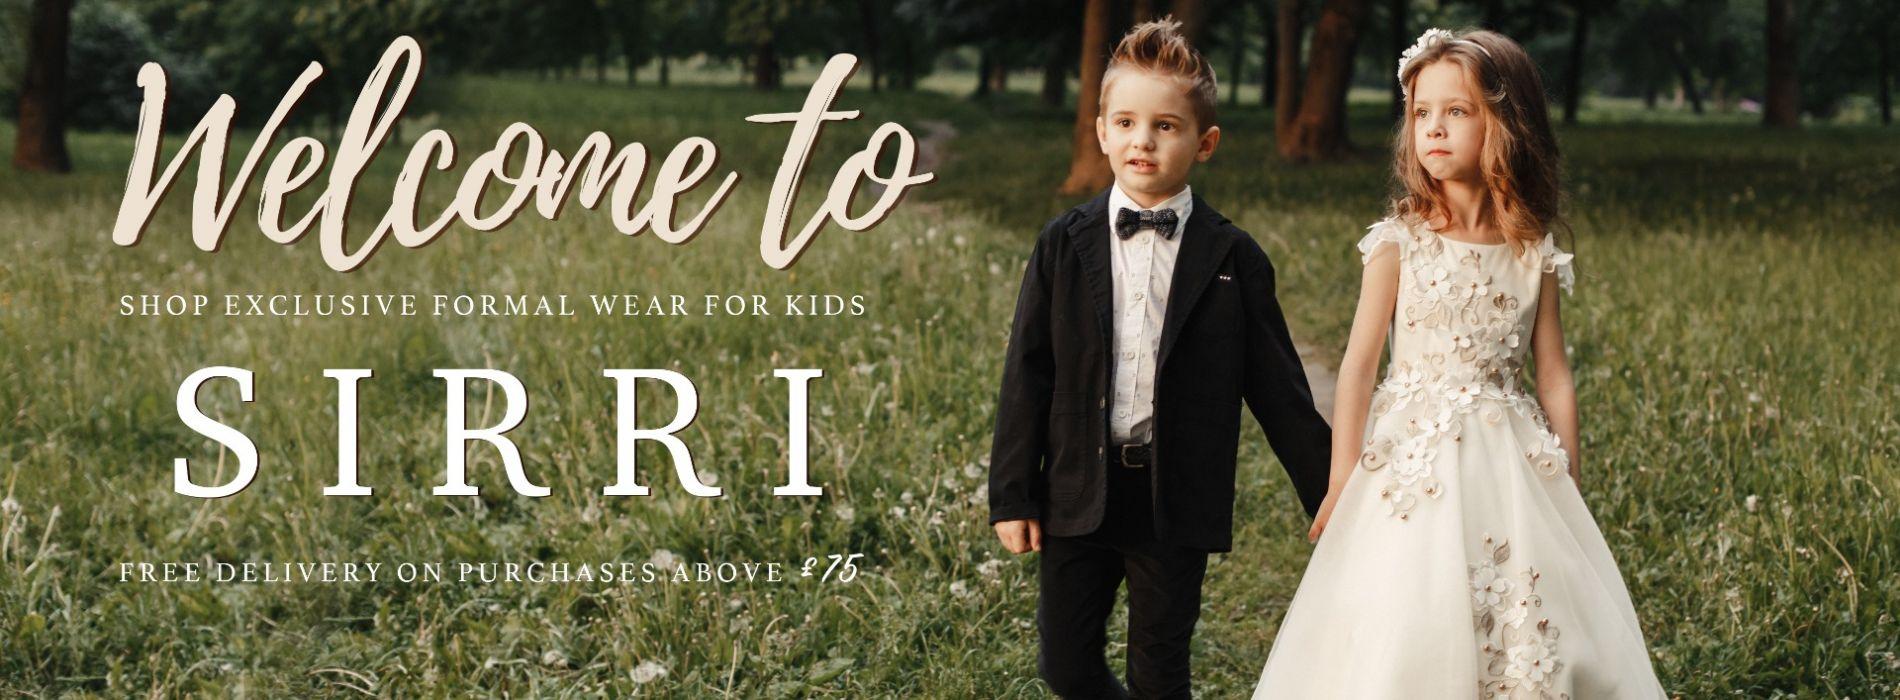 a0e2832abba66 Boys Suits   Girls Bridesmaid Dresses   Boys & Girls Formal Shoes ...